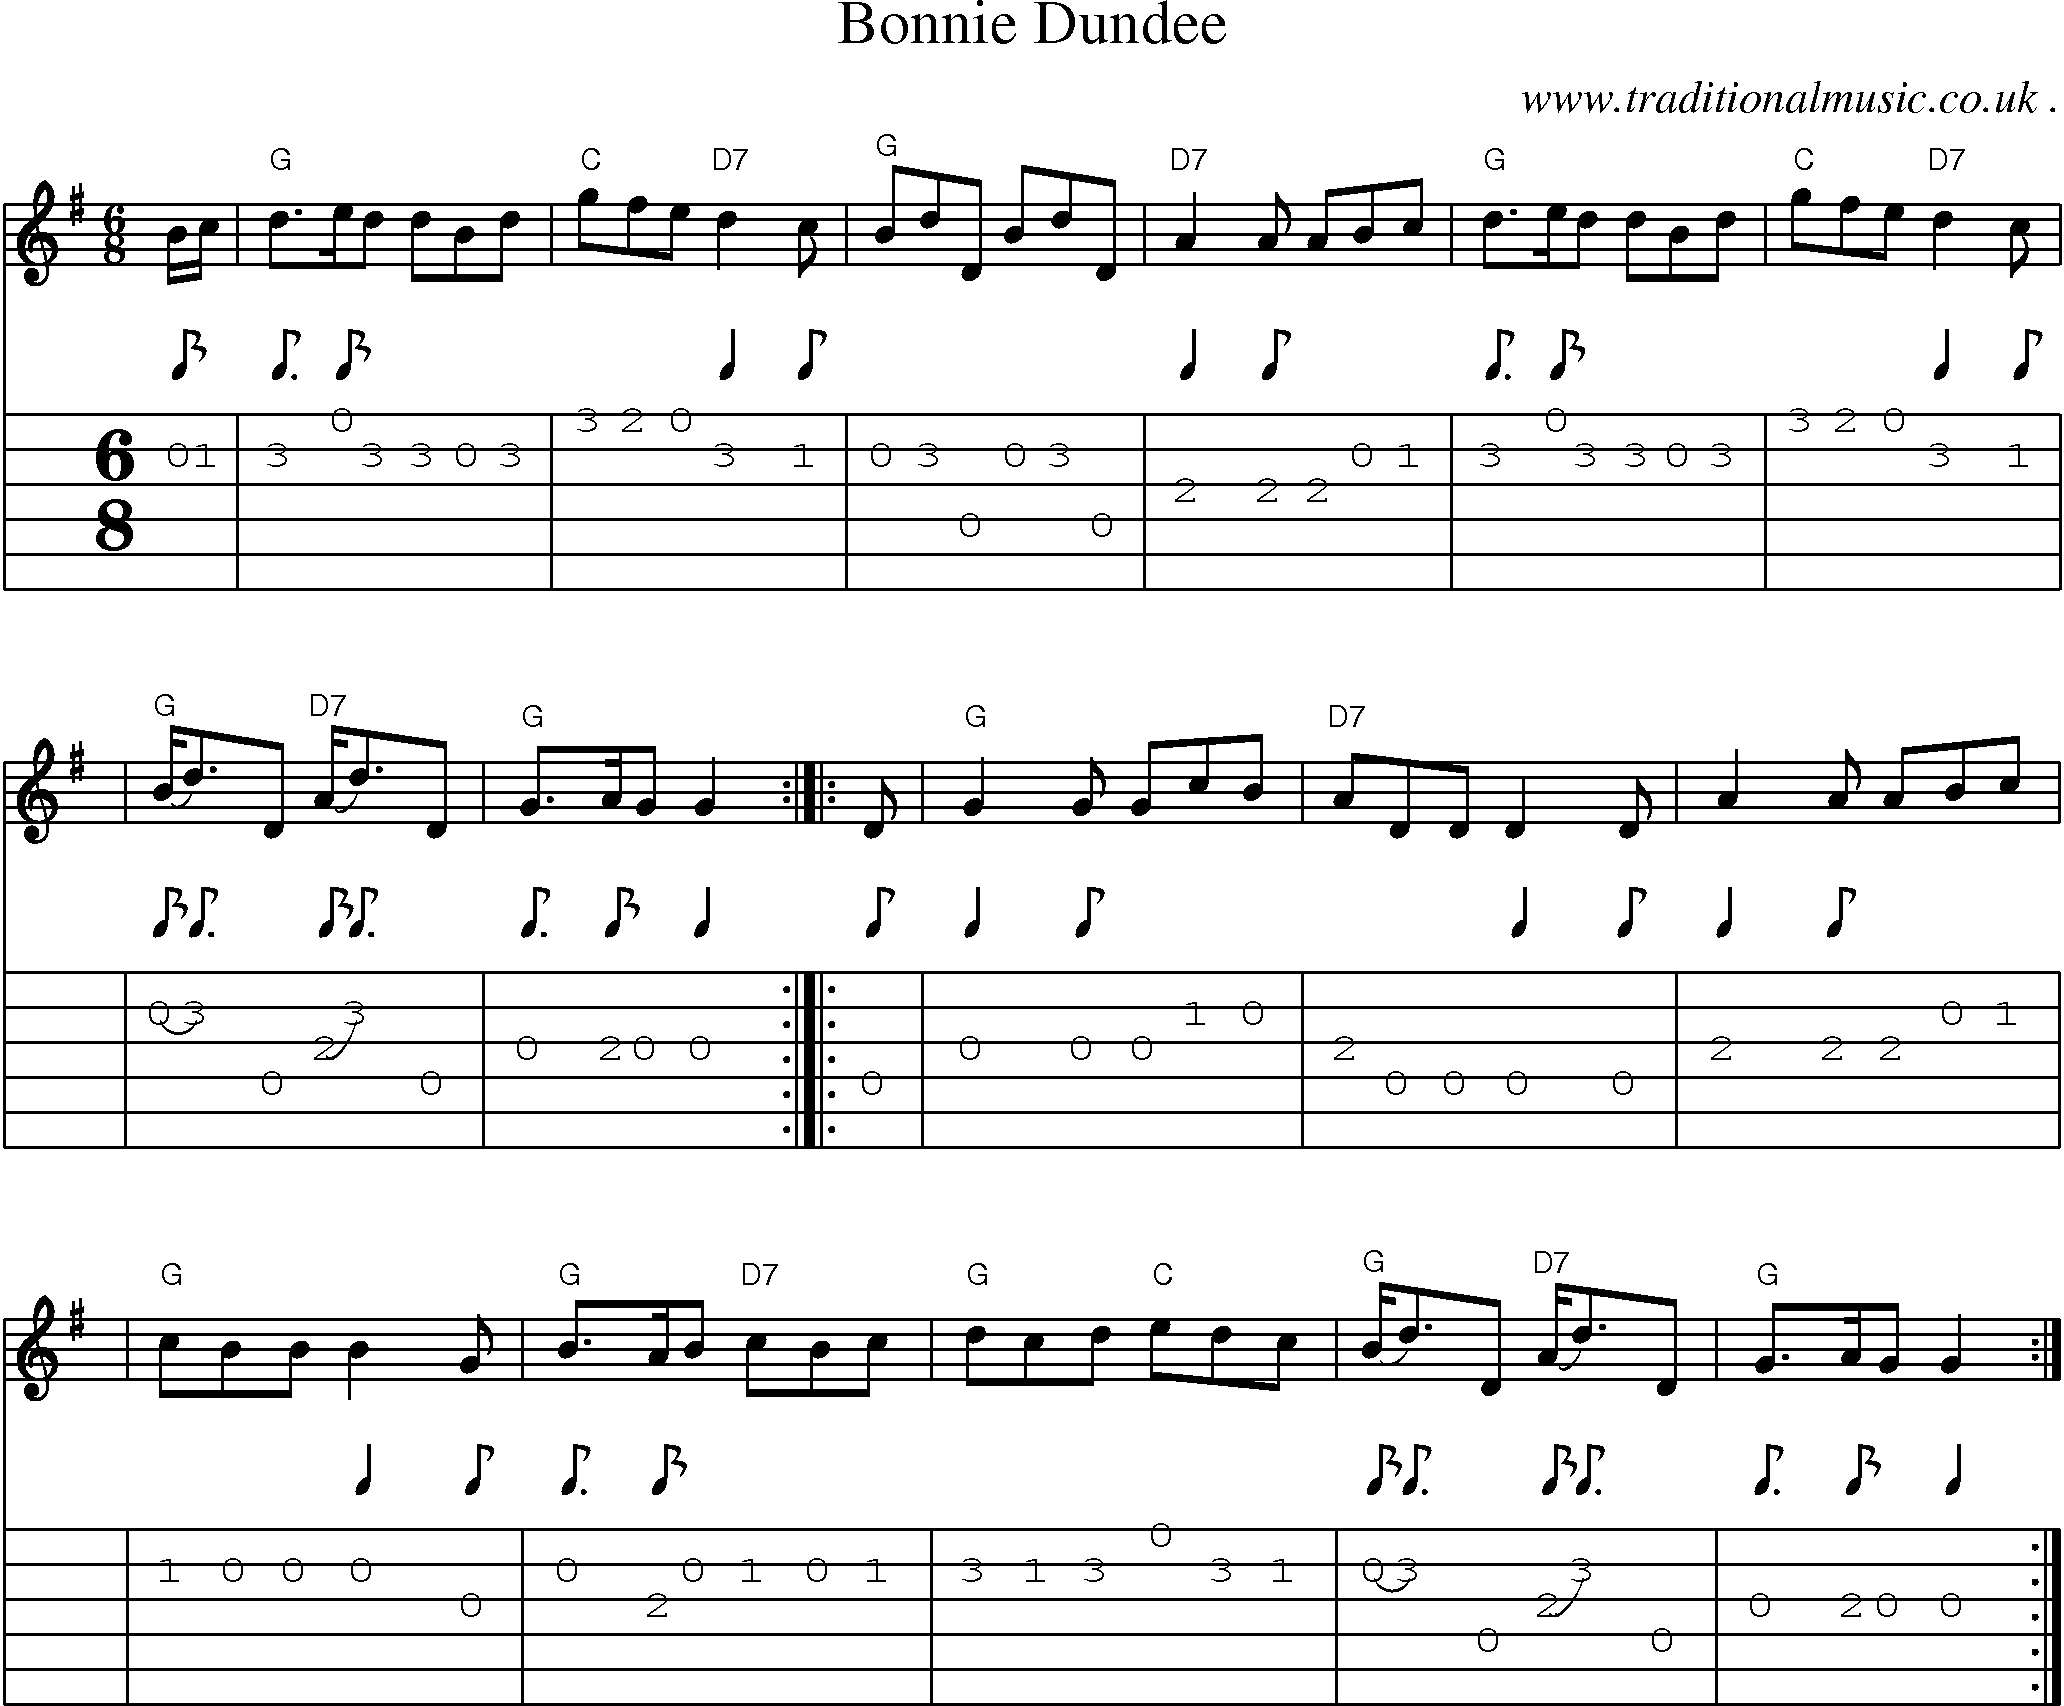 Scottish Tune Score Guitar Chords Tabs Bonnie Dundee Guitar